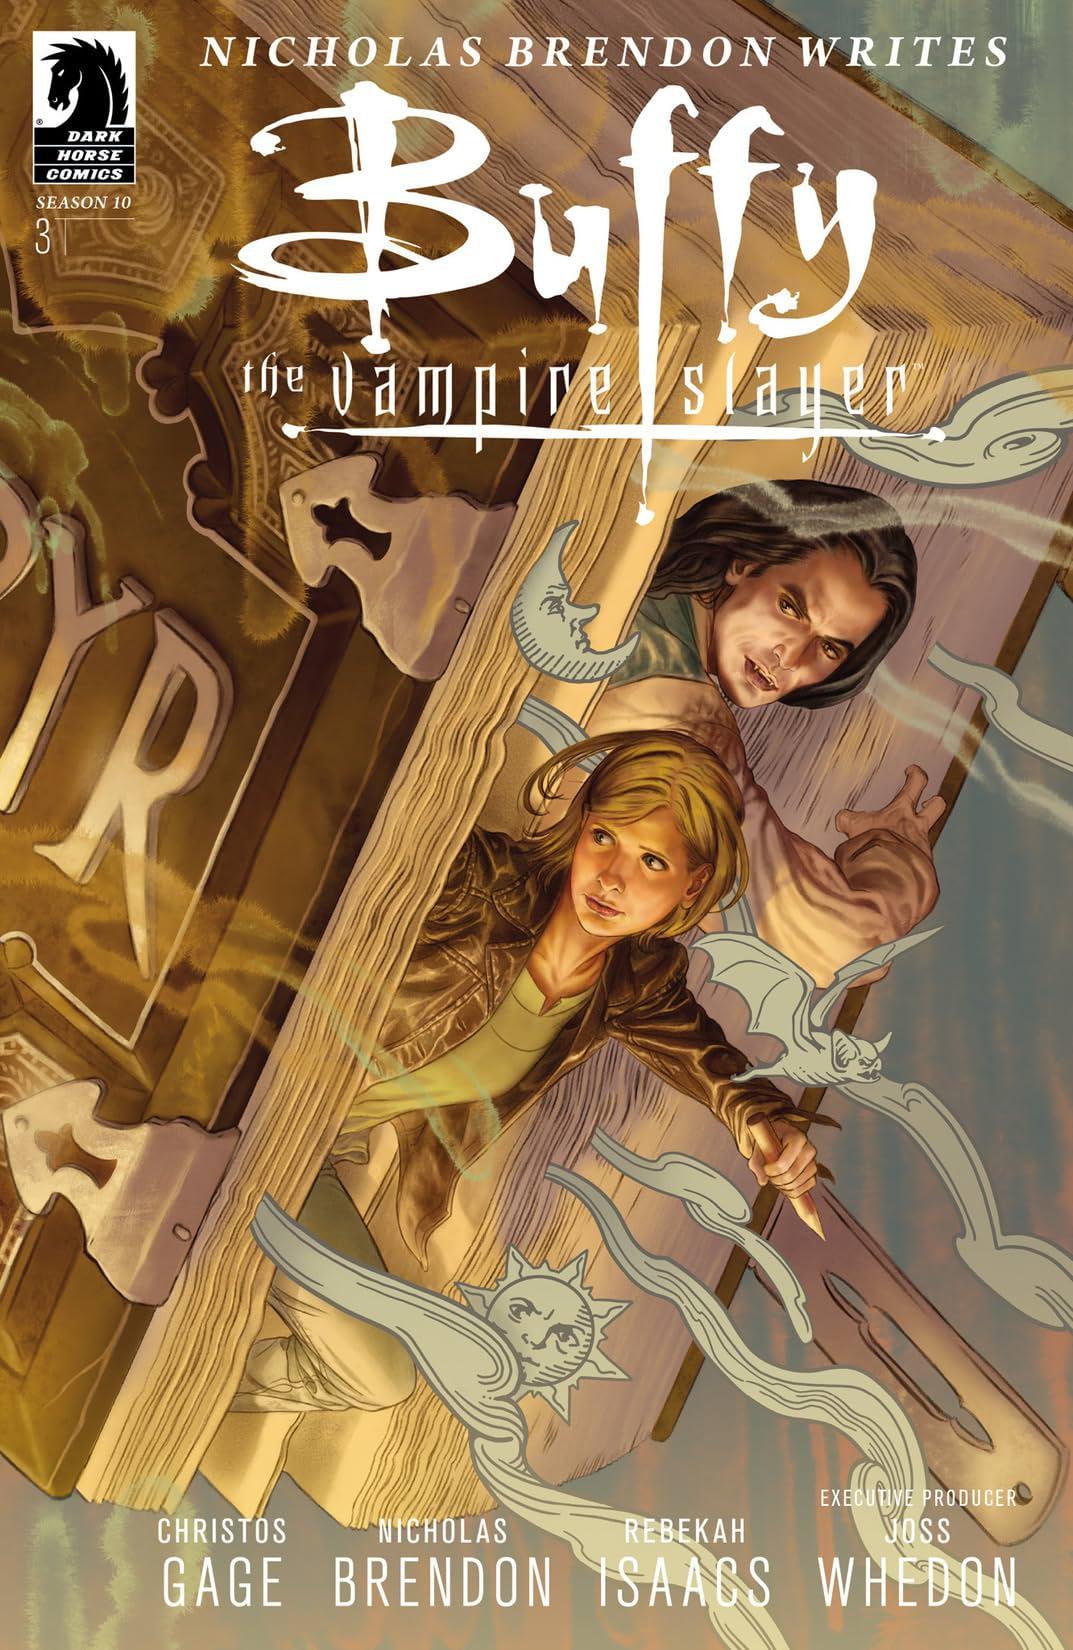 Buffy the Vampire Slayer: Season 10 #3